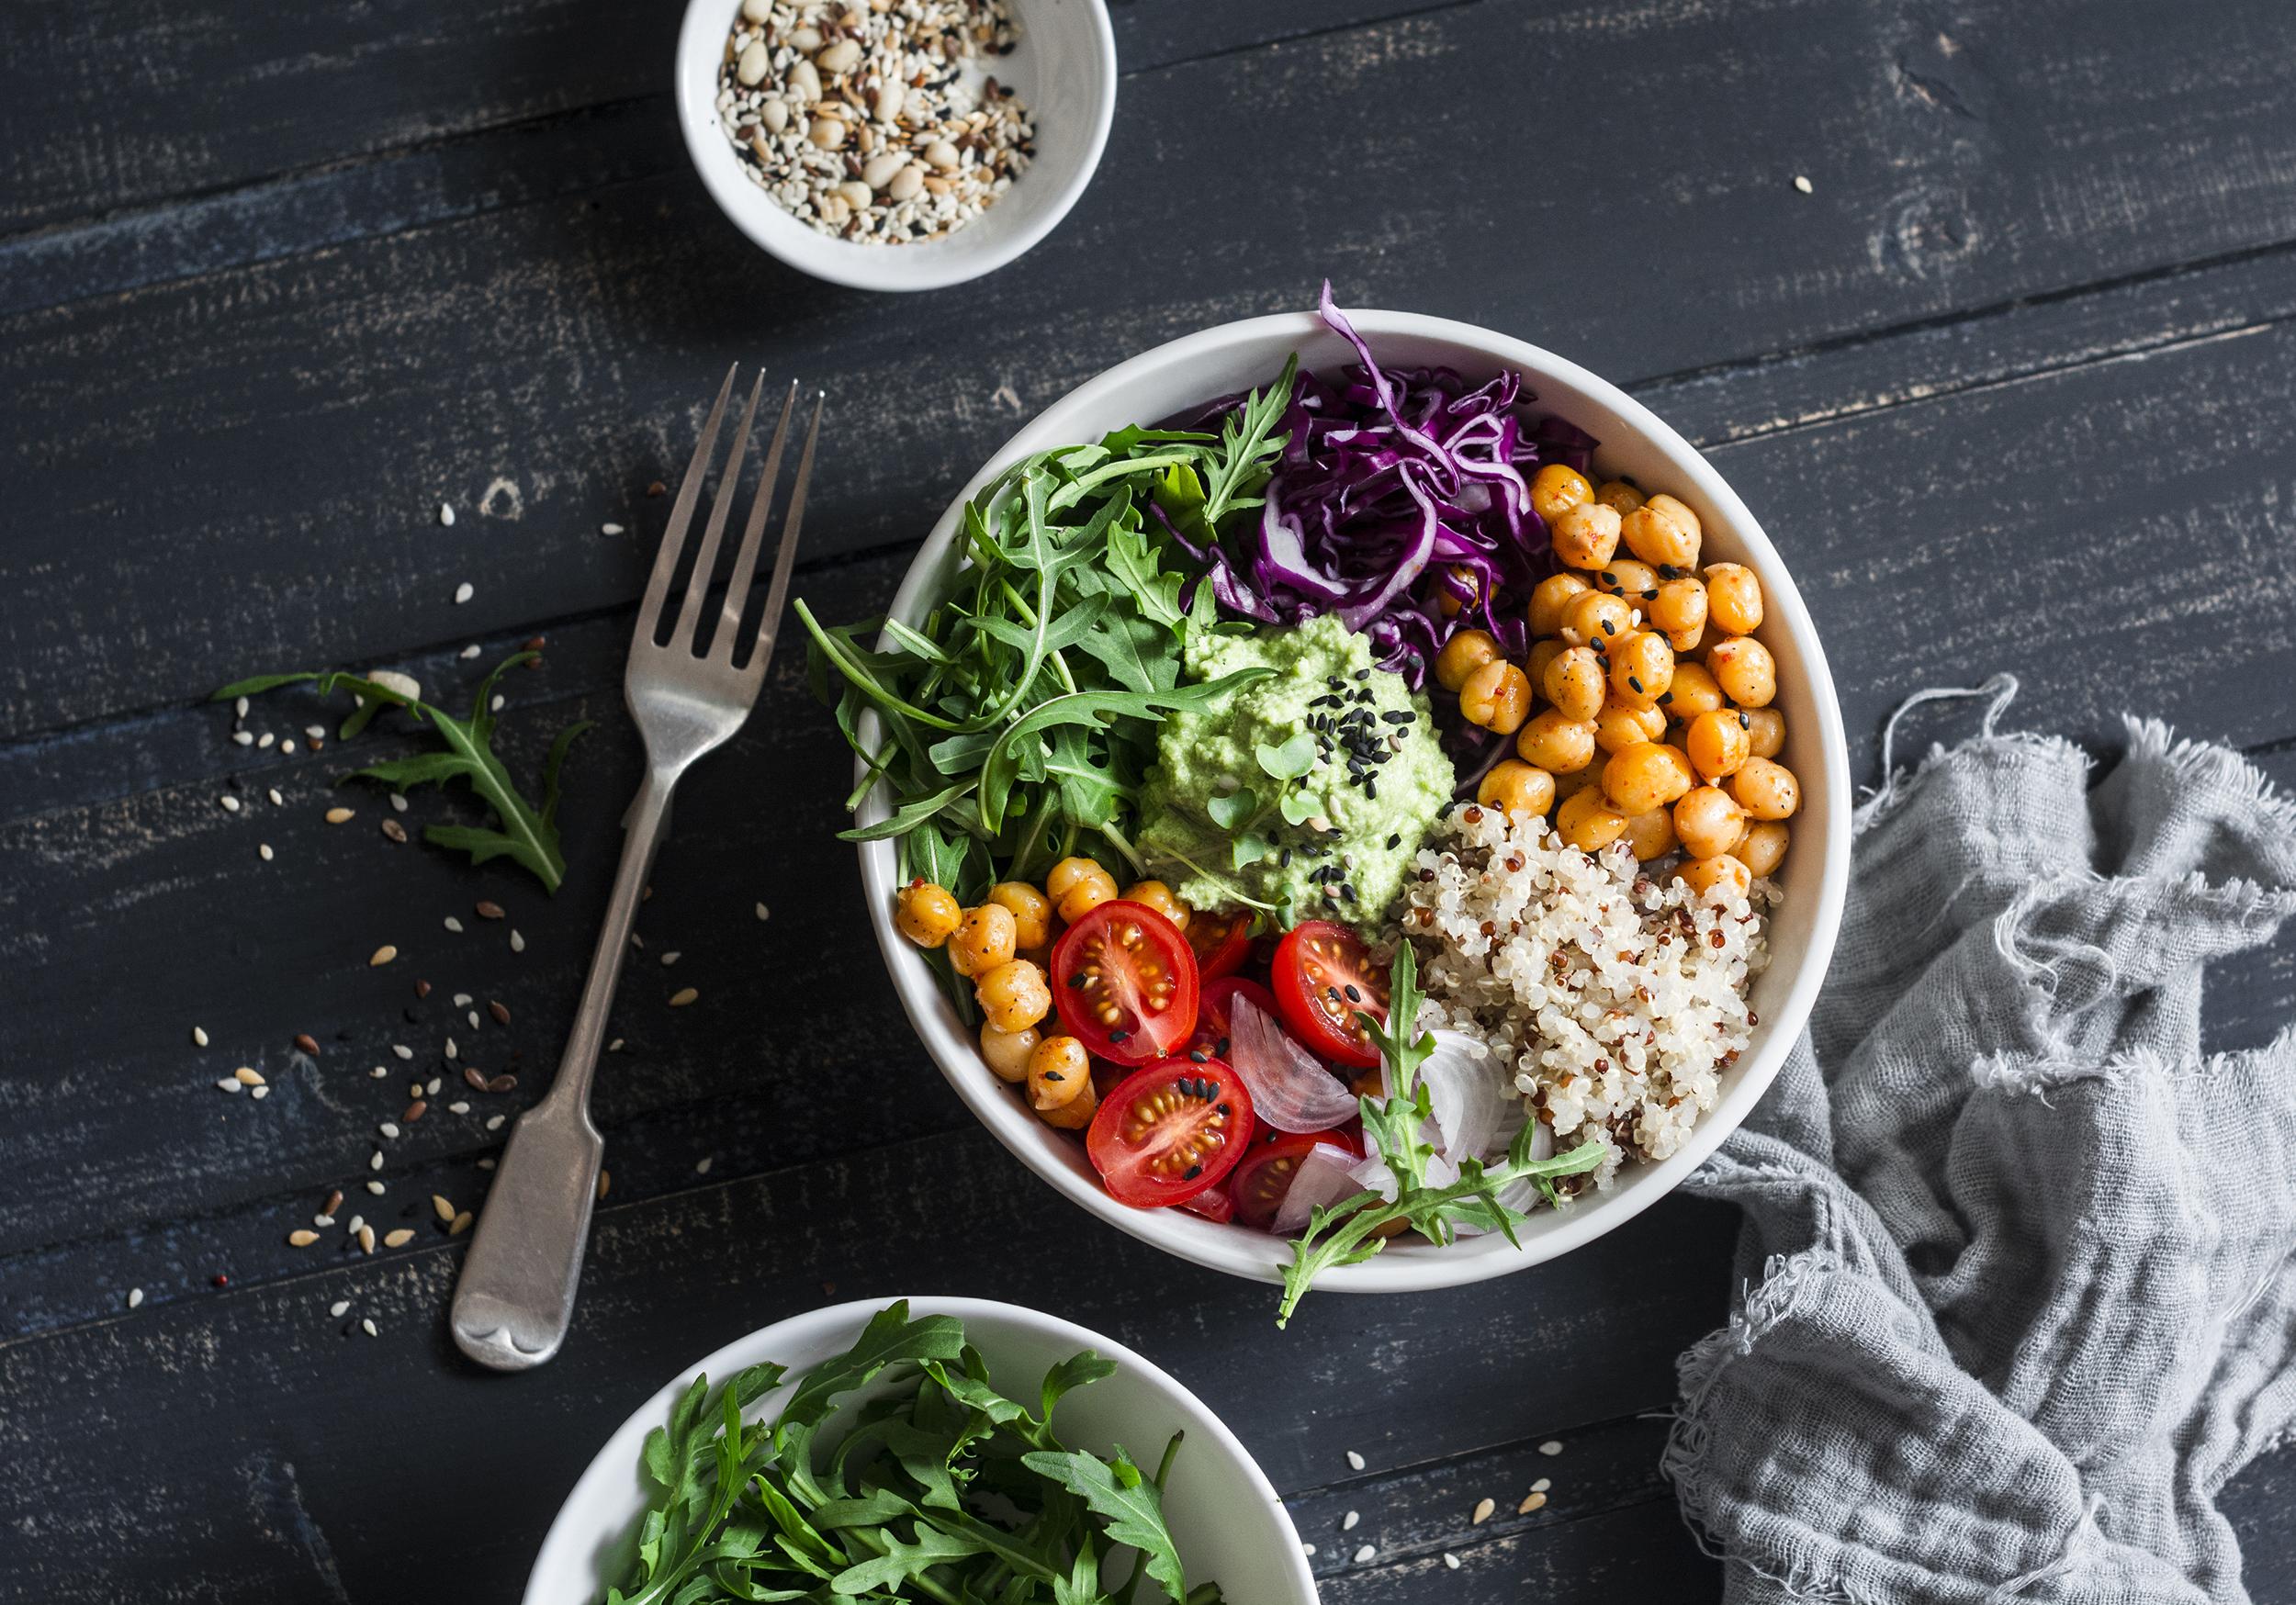 diet food at home